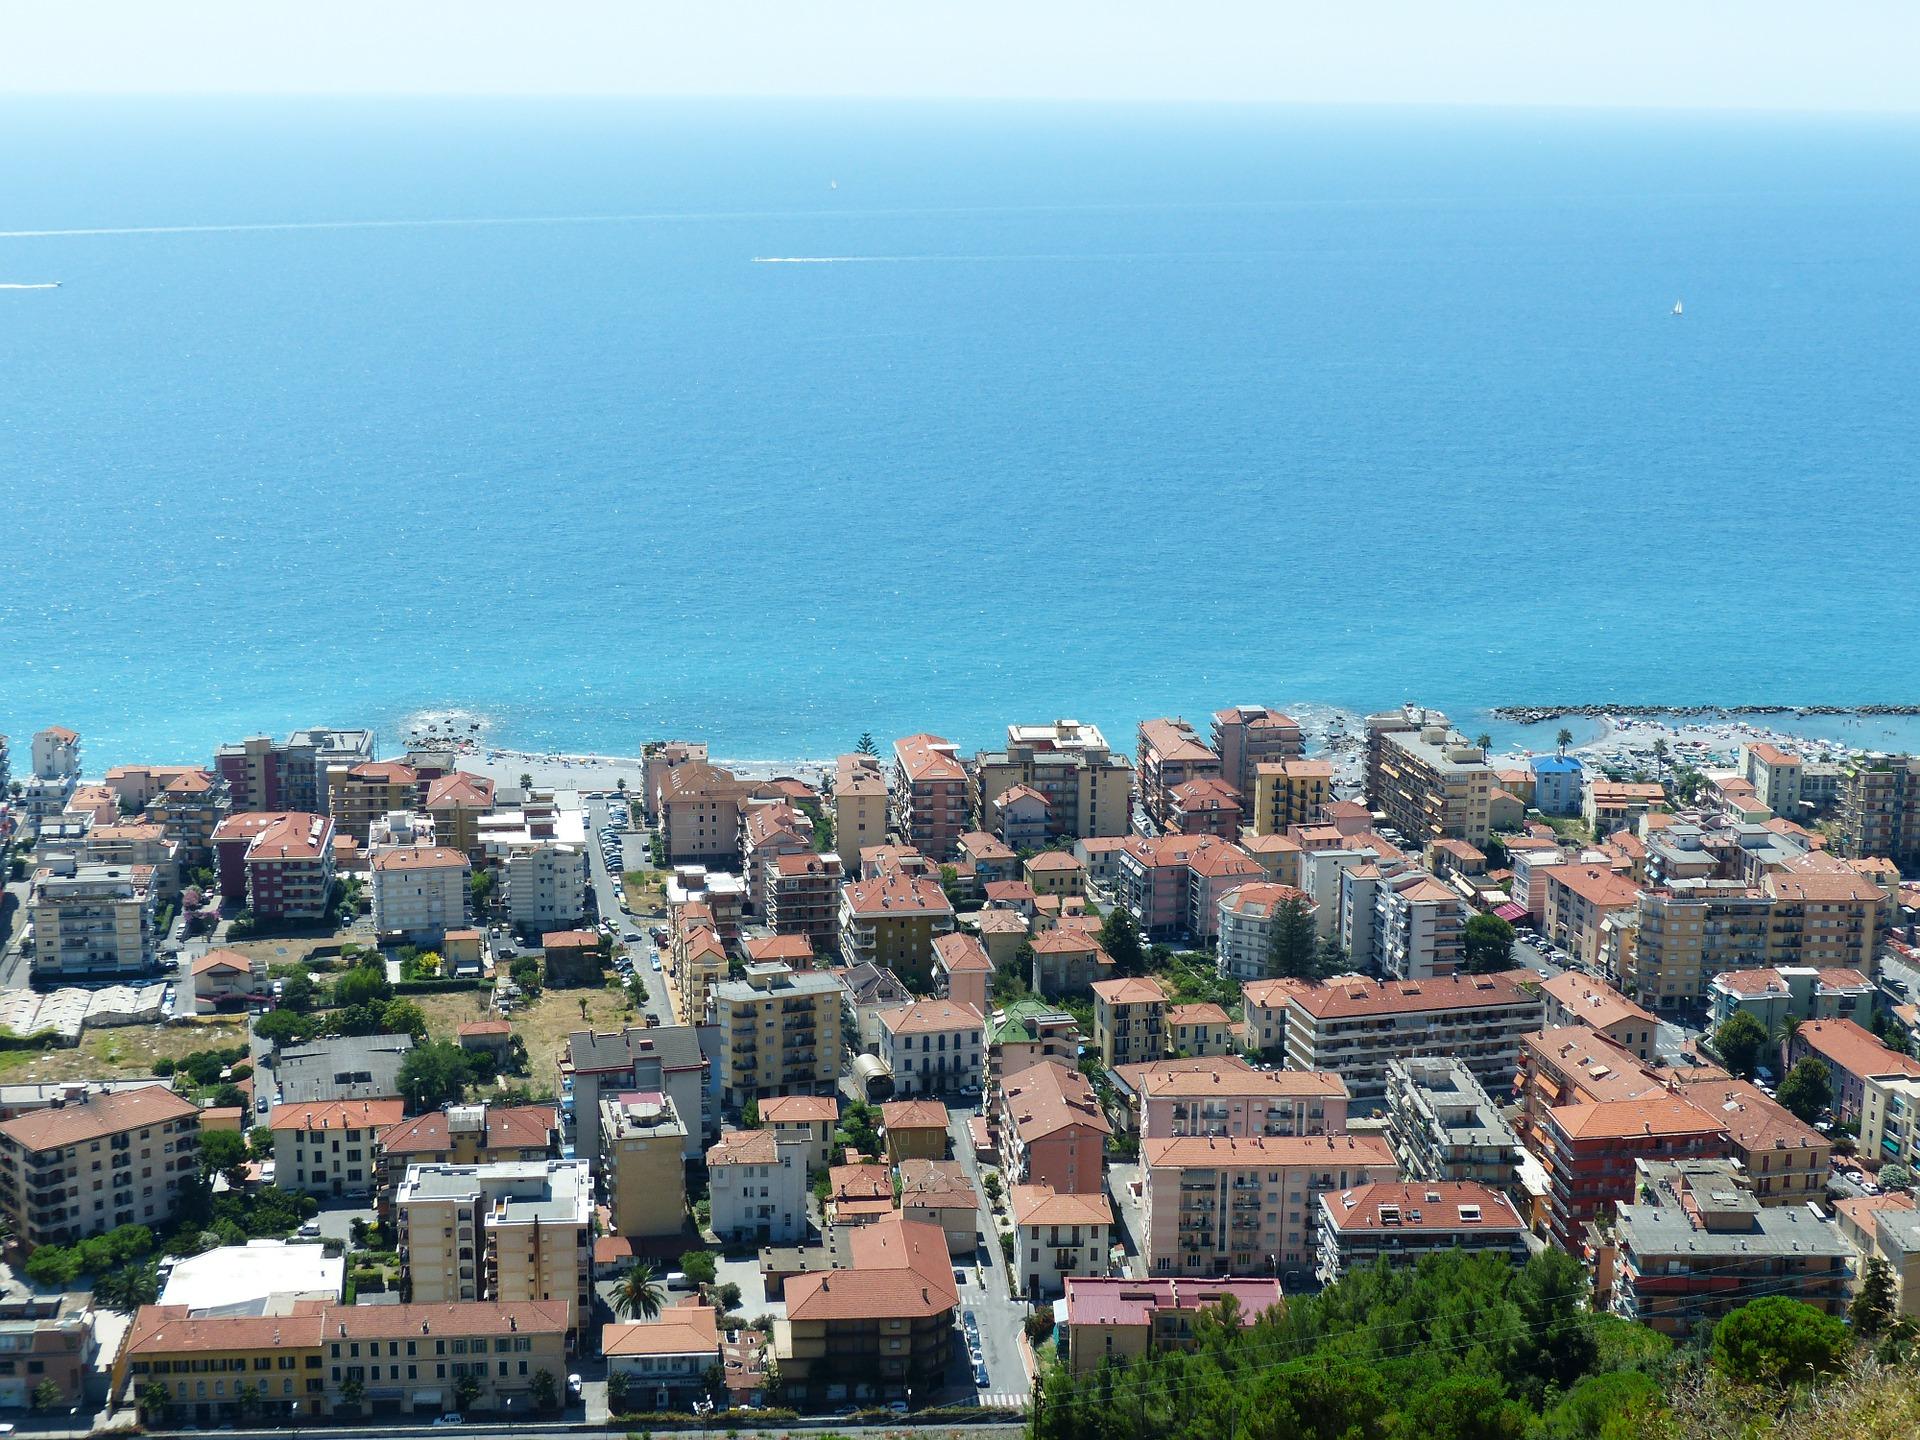 Ventimiglia, Ligurië, Italië